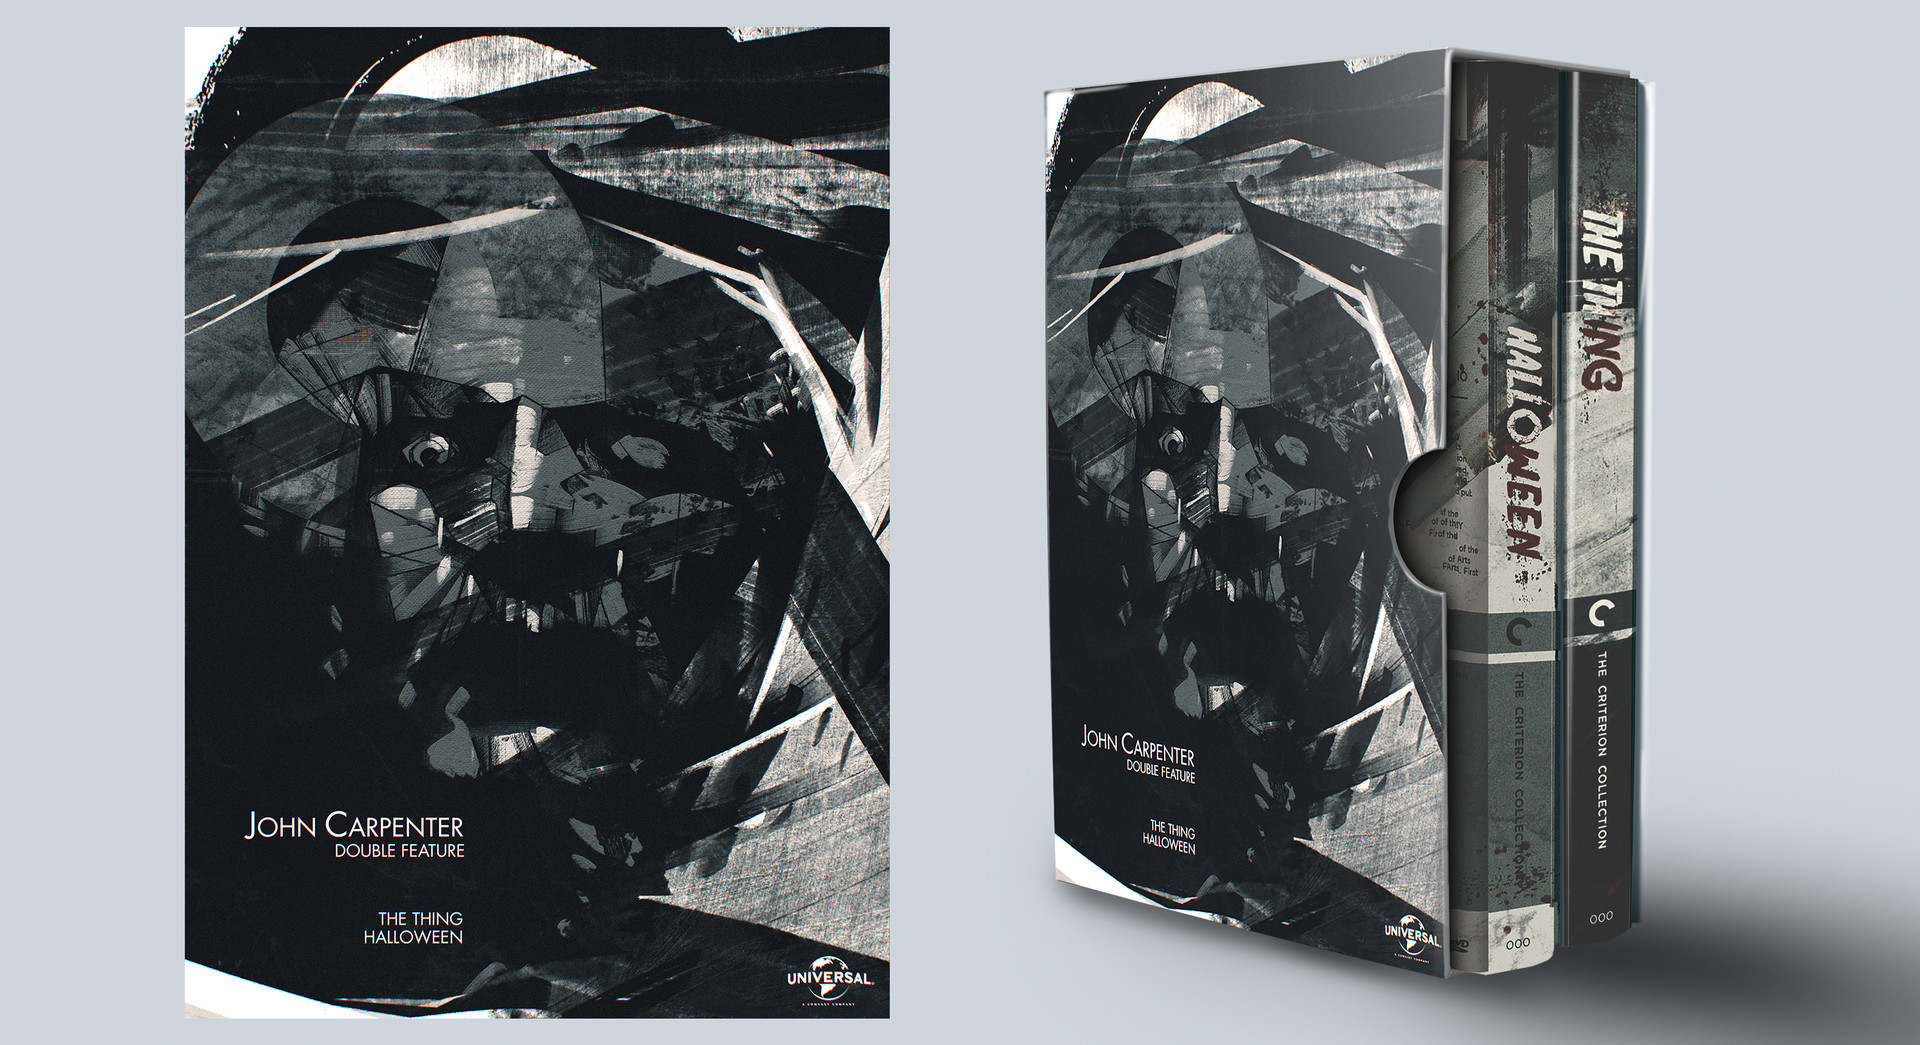 pouya moayedi - dvd box set + cover design : a tribute to john carpenter